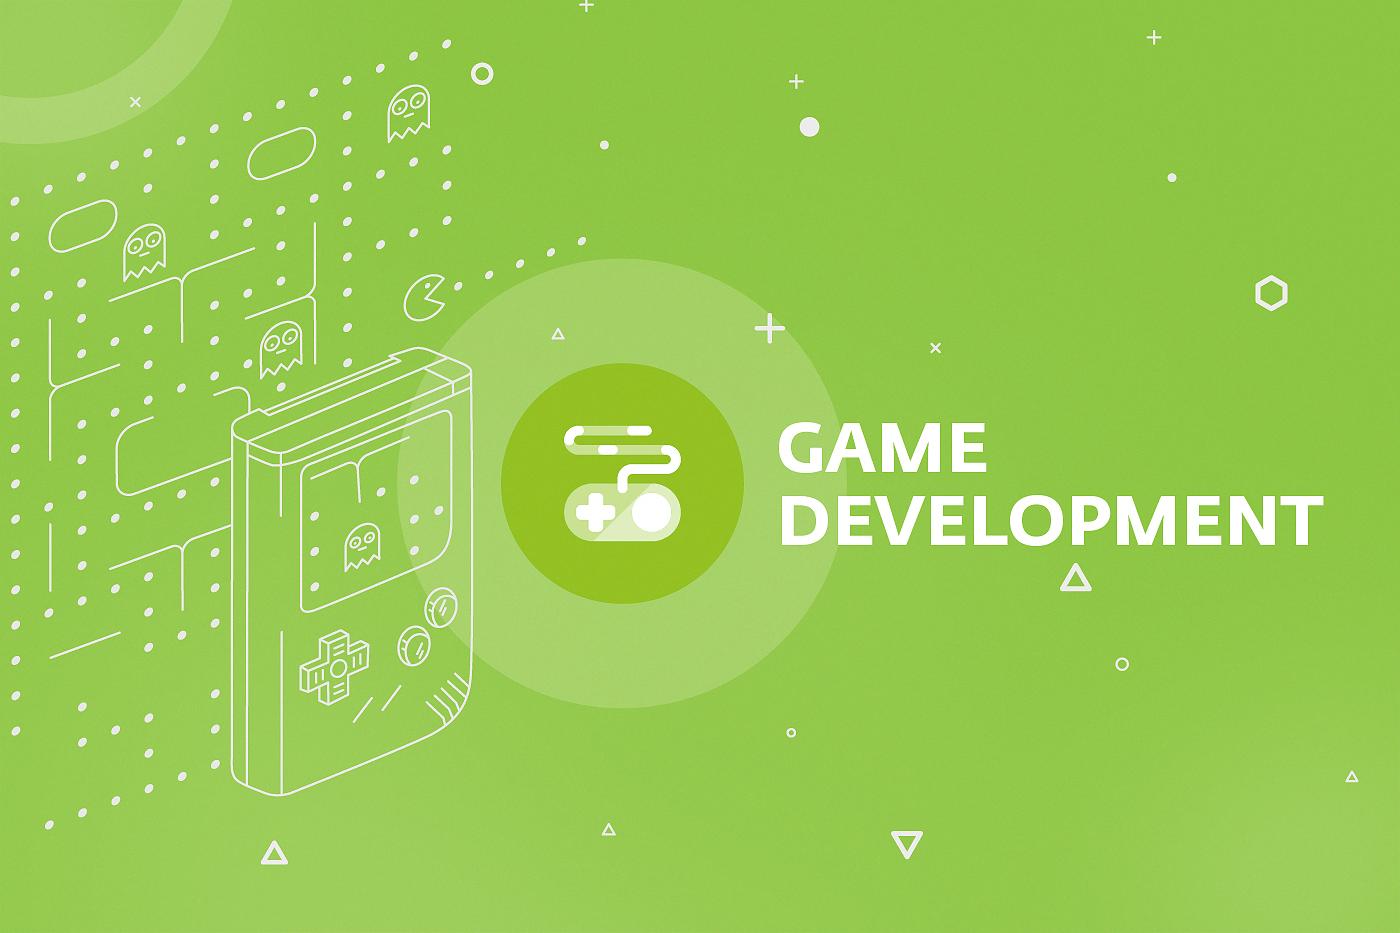 game eng - Game Development